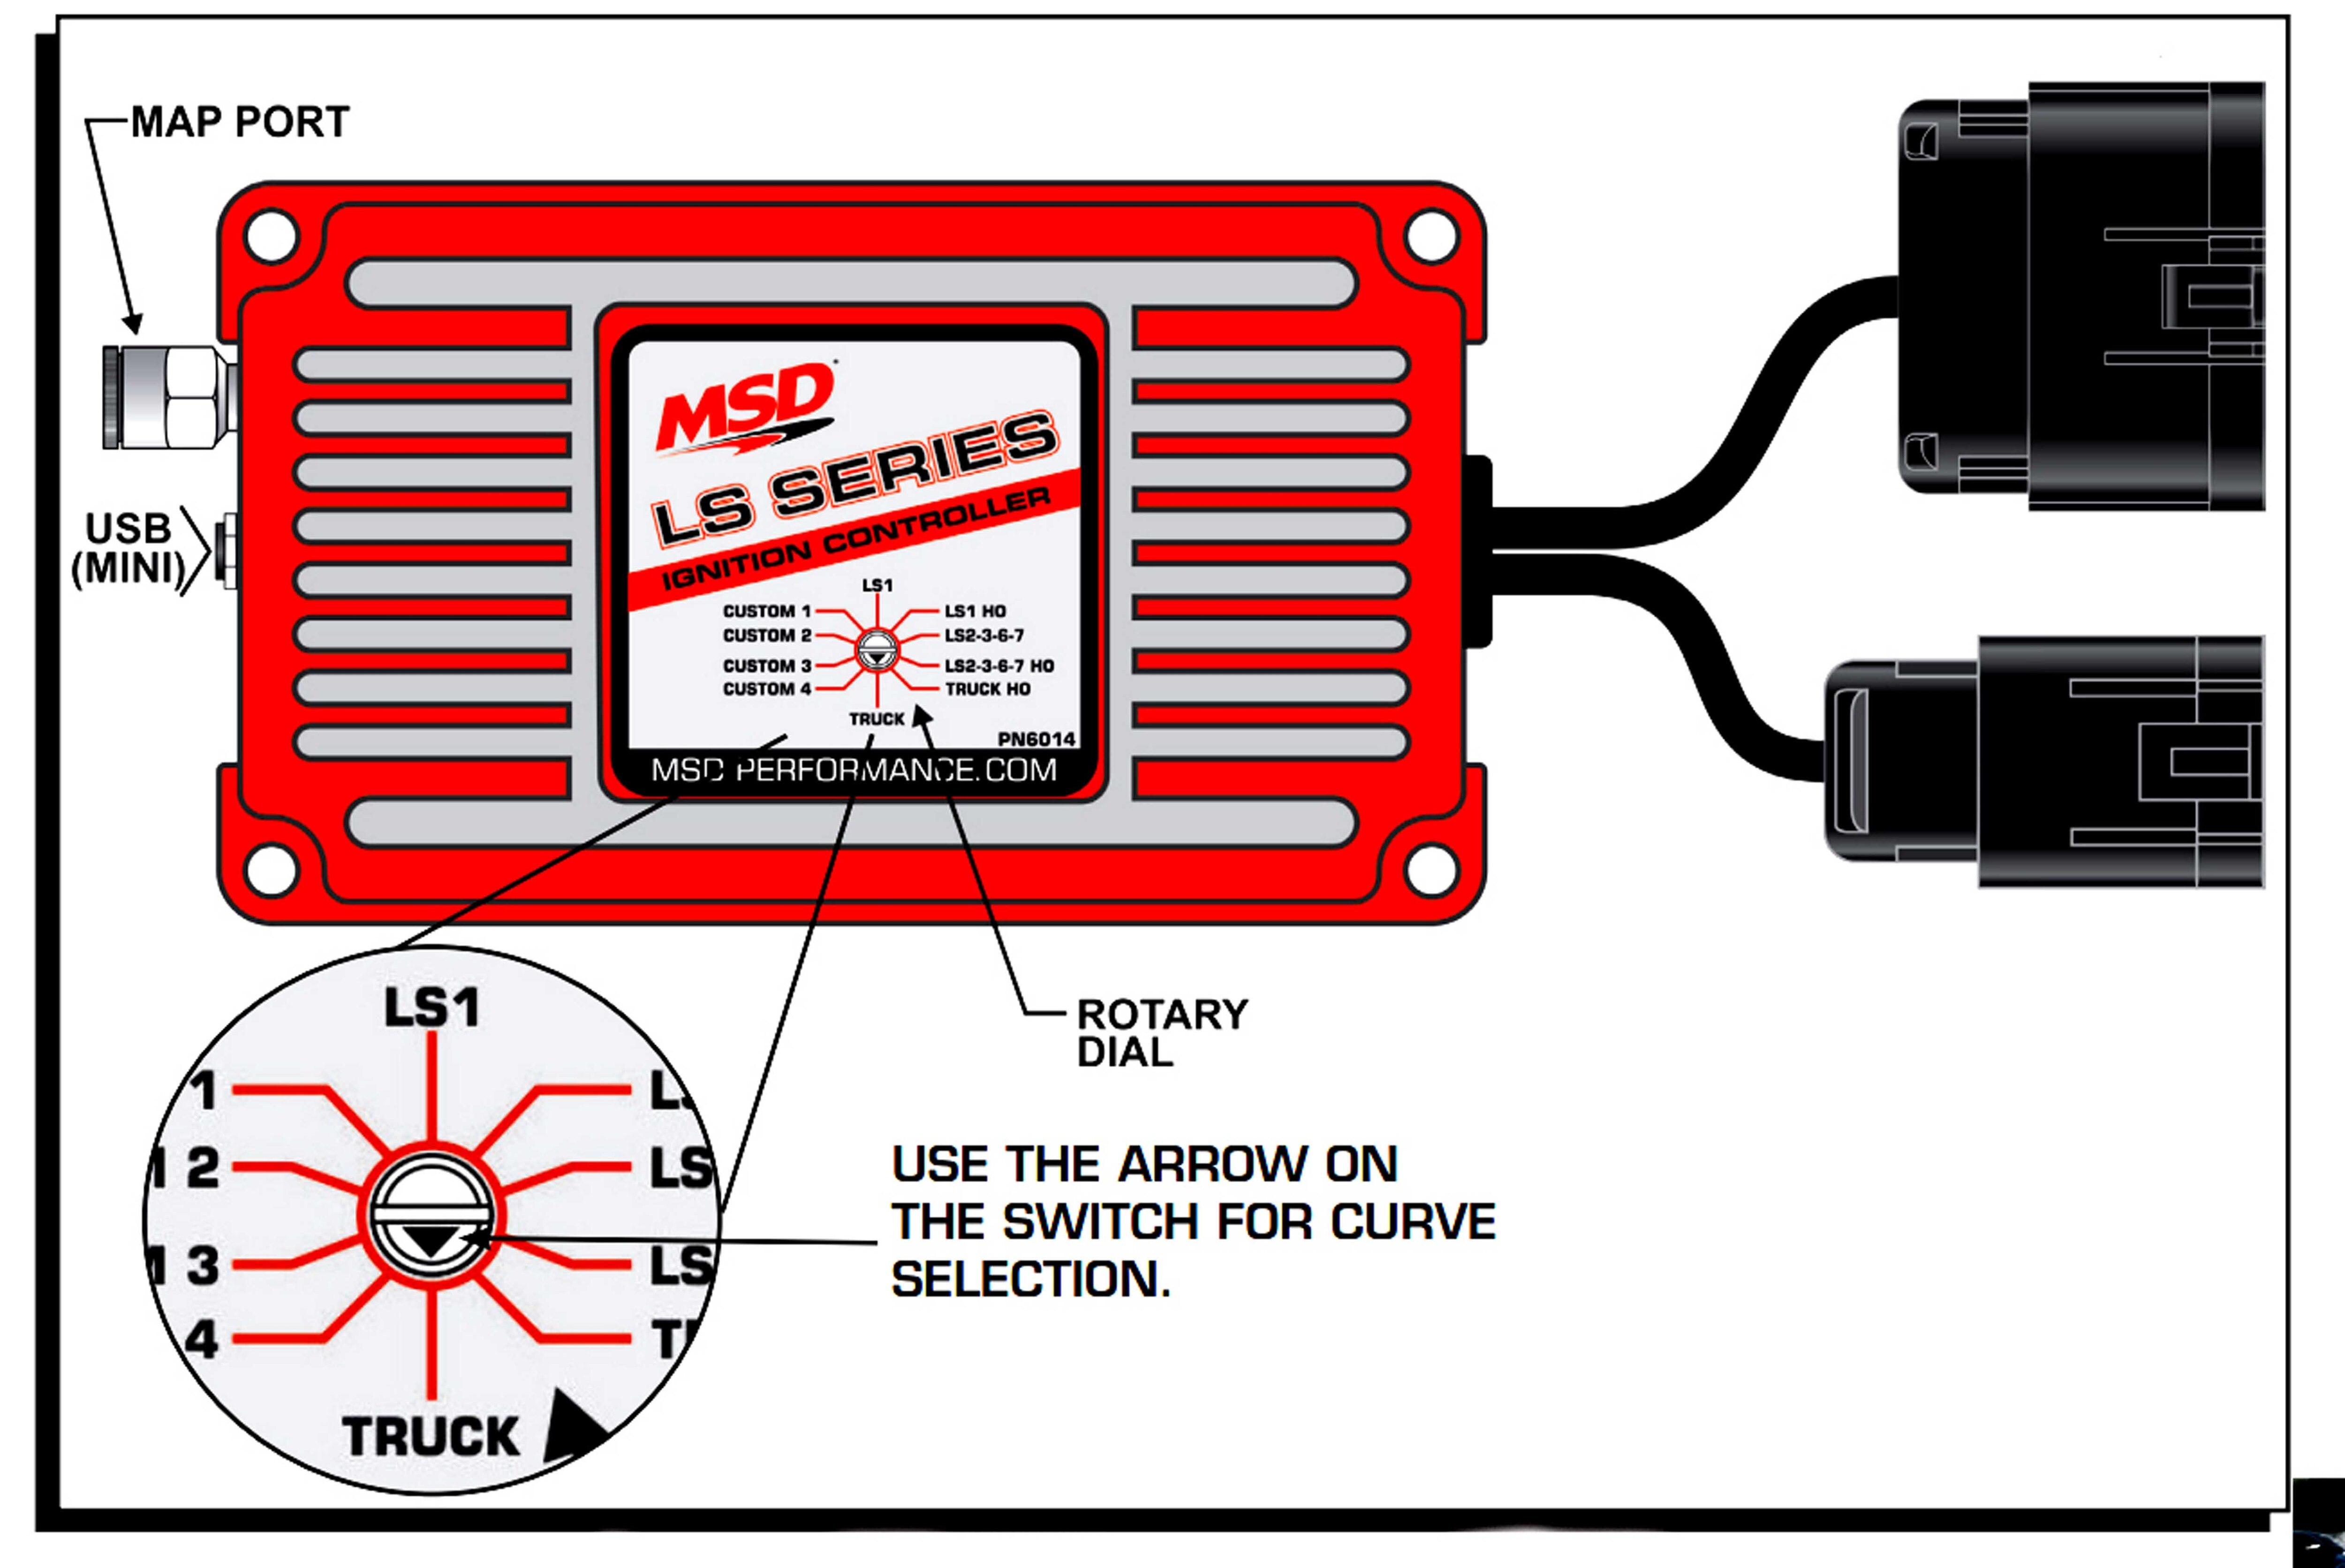 Msd 6ls Wiring Diagram 2006 Gmc Sierra Fuse Panel Diagram Air Bag Nescafe Jeanjaures37 Fr